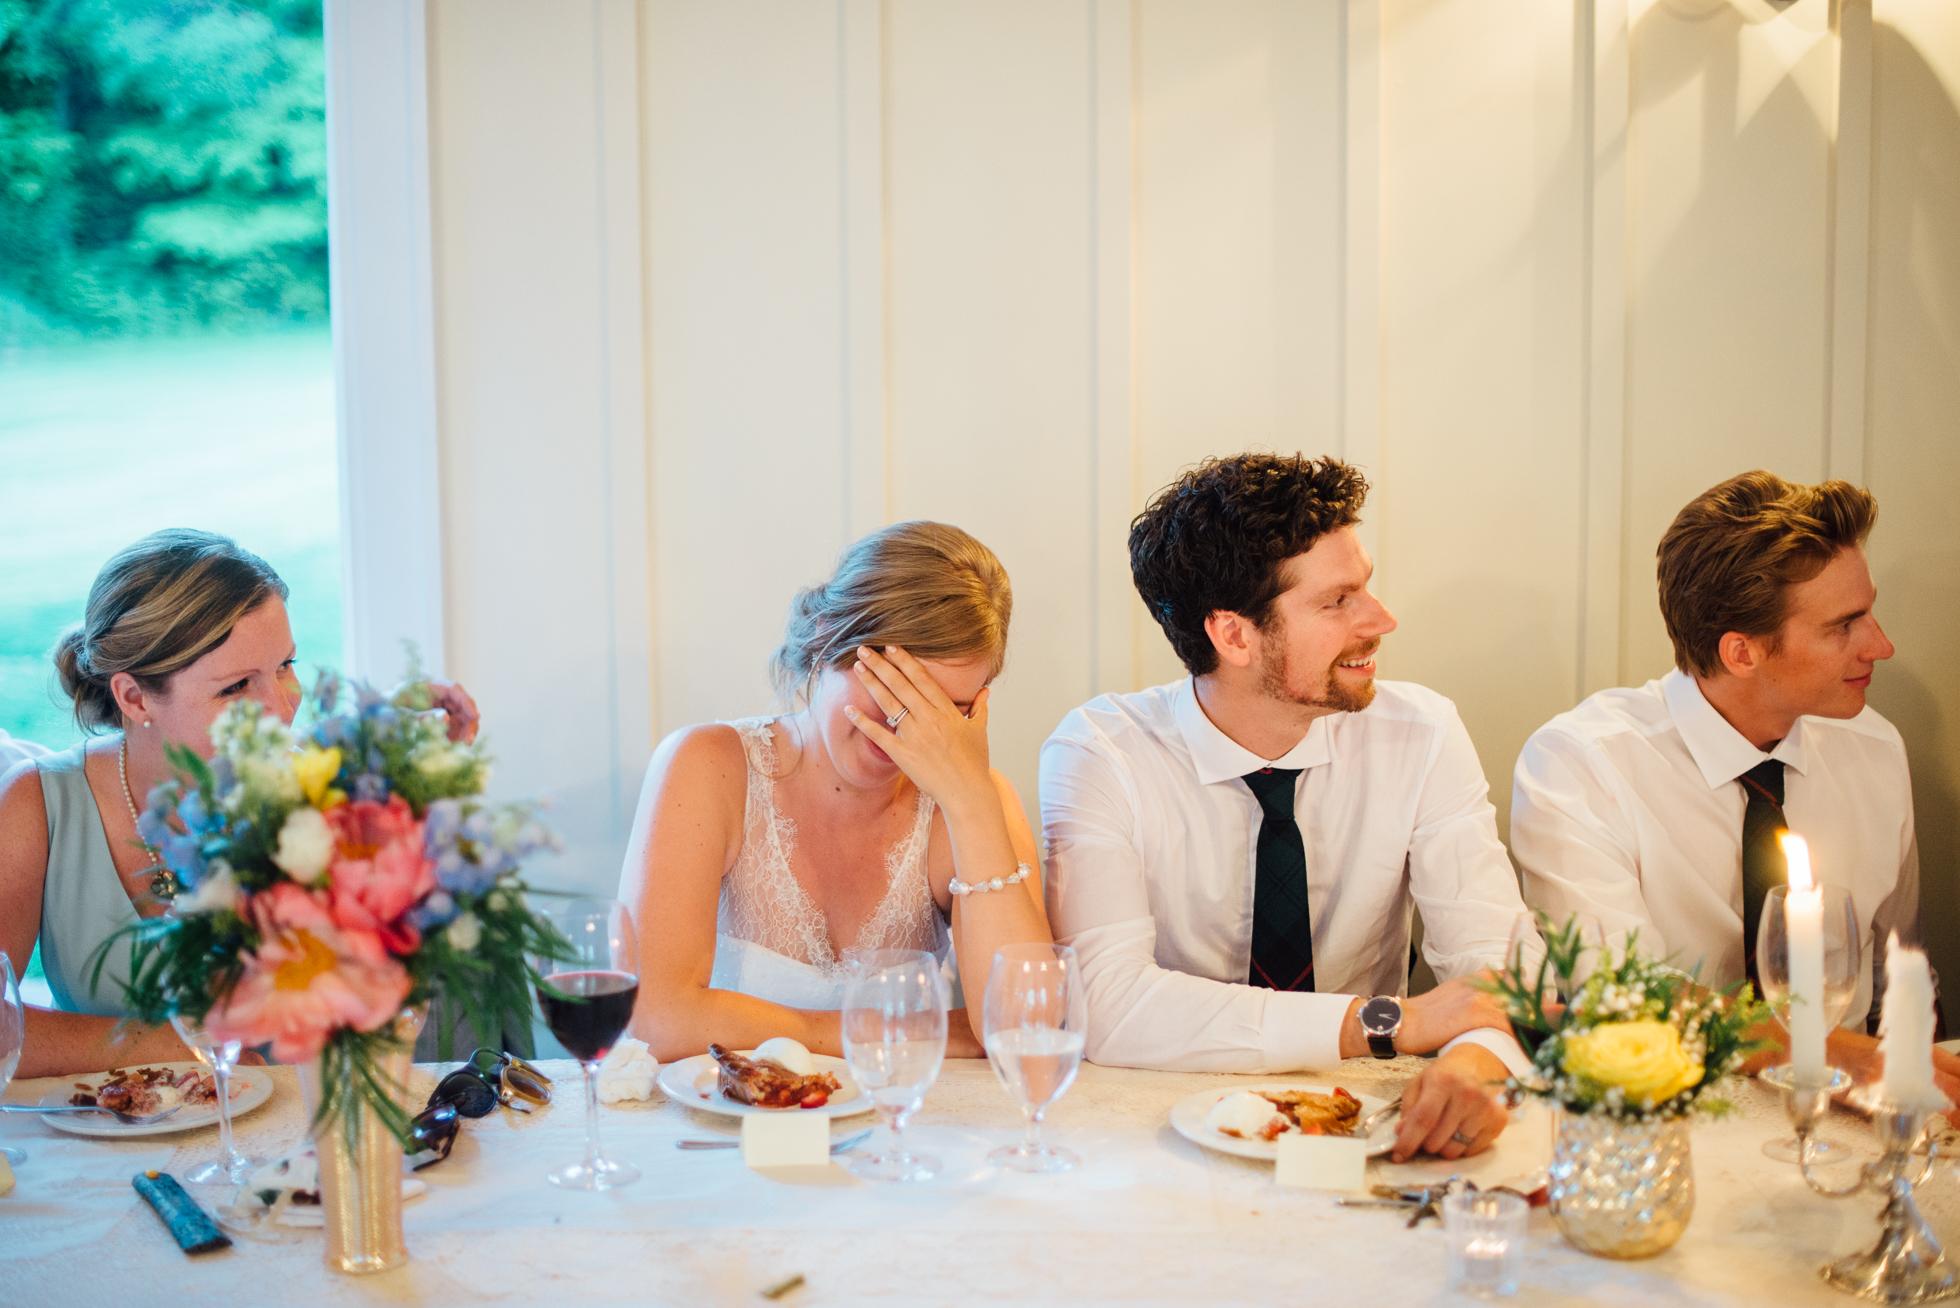 Outdoor-Caledon-Tralee-Wedding-Photography-109